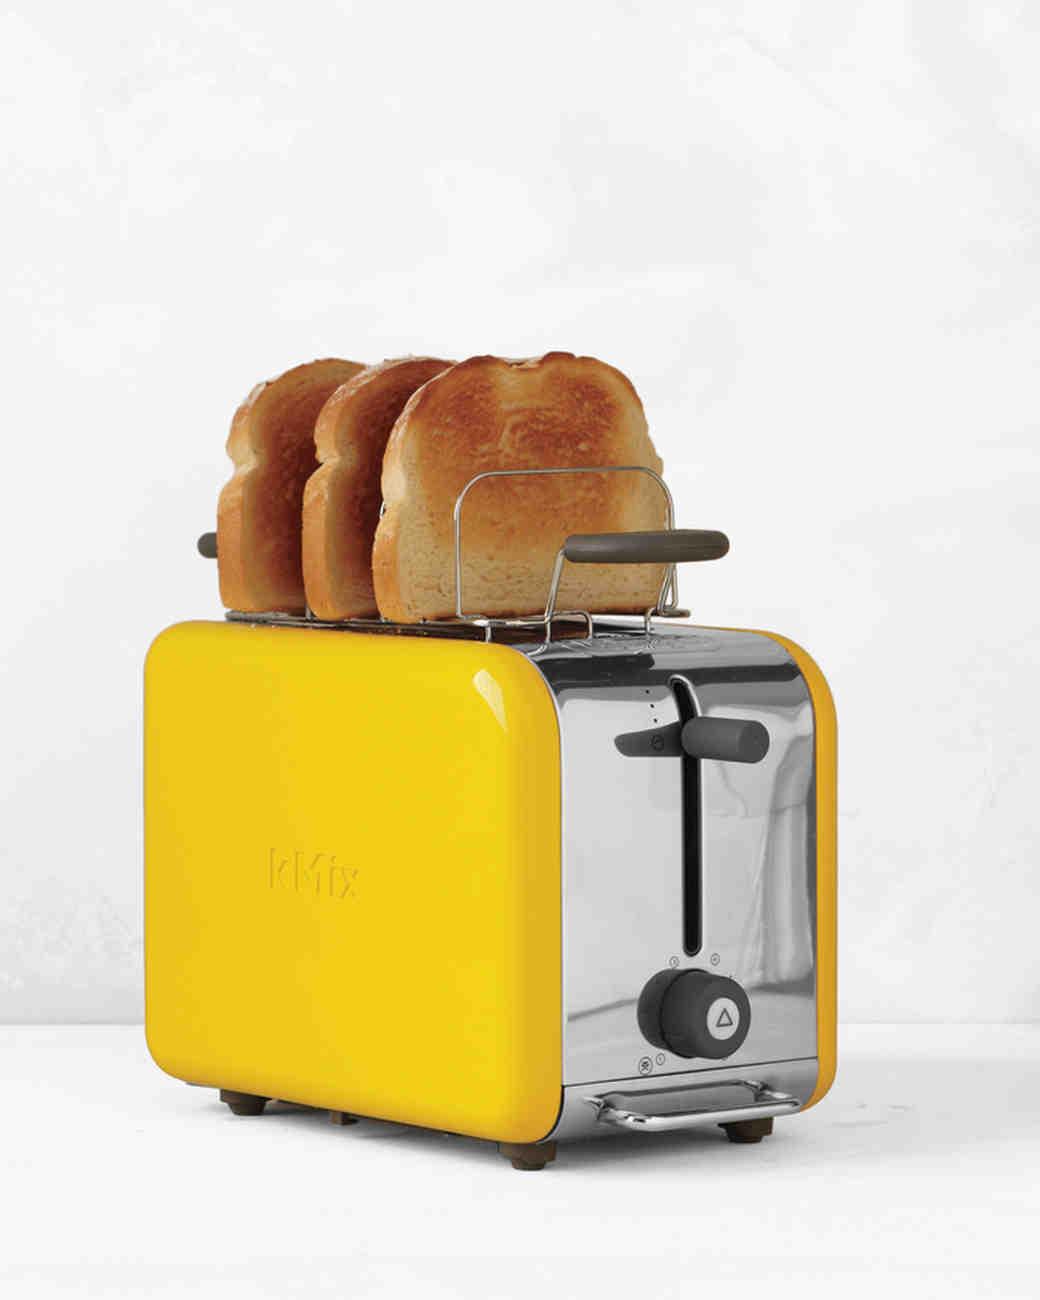 delonghi-toaster-mwd108187.jpg